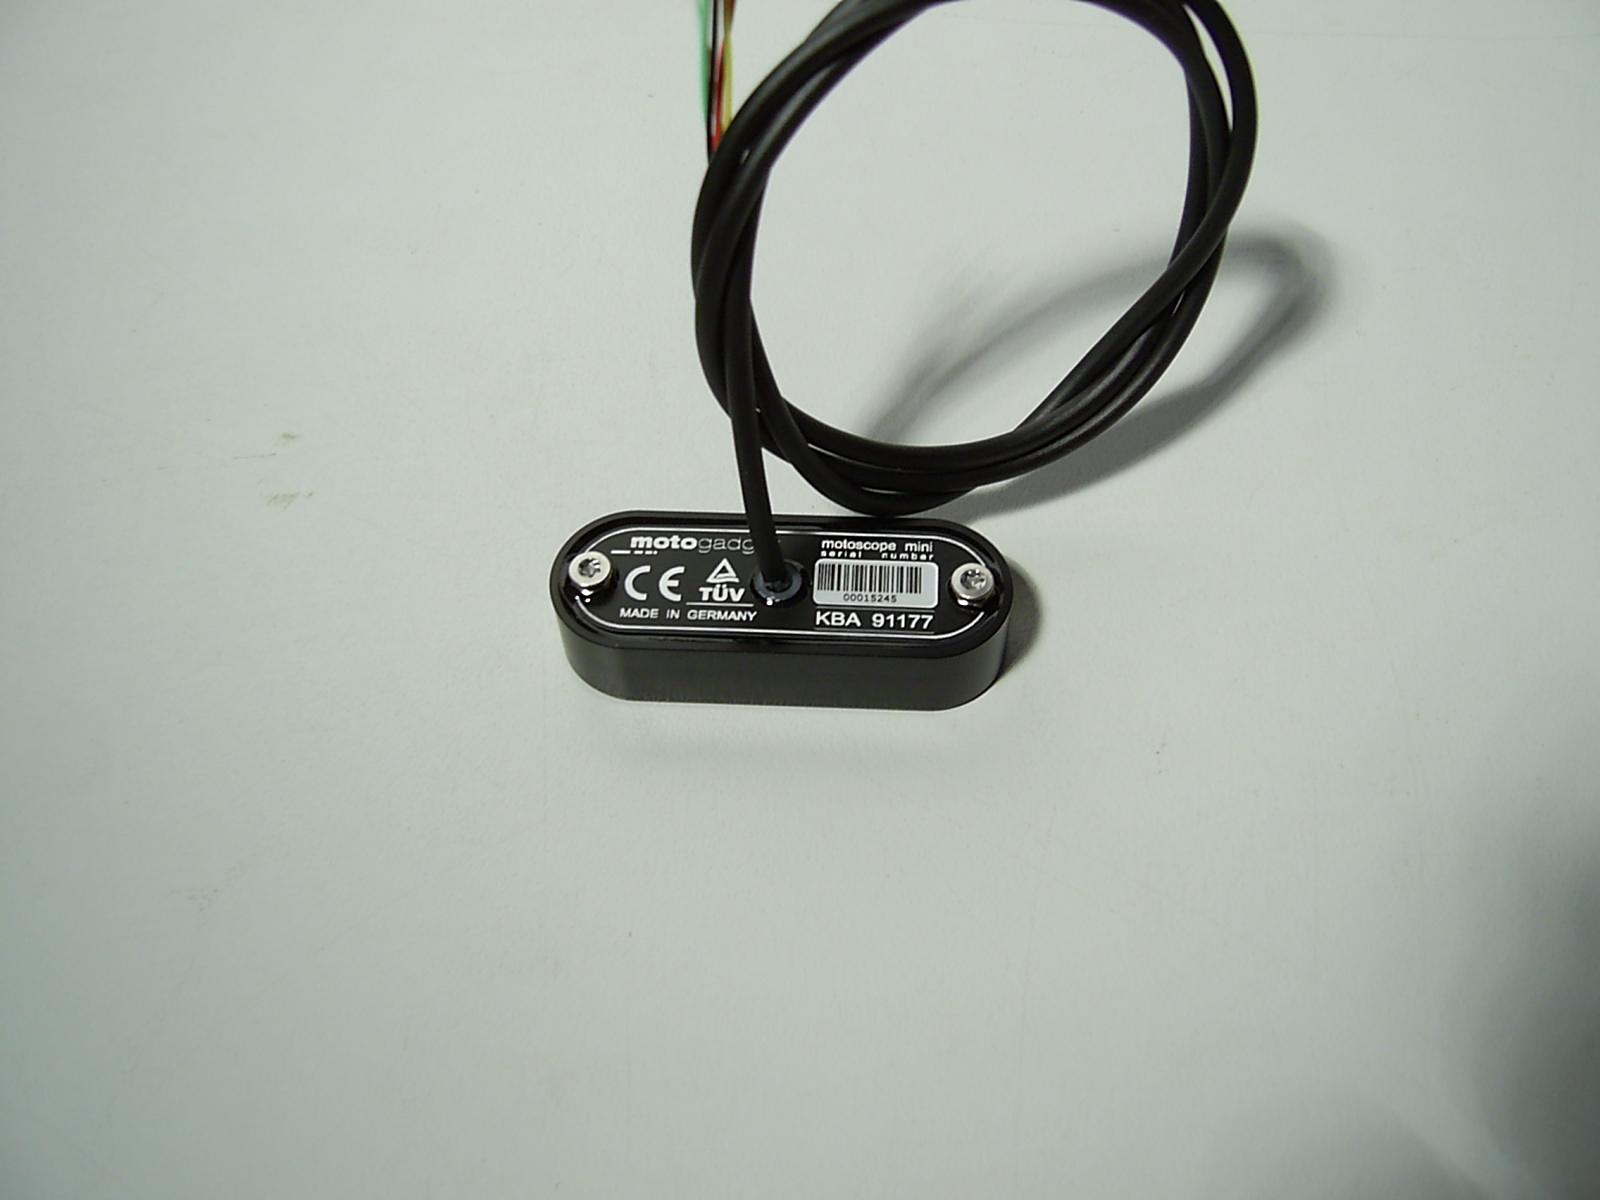 bikeparts p schl motoscope mini digital tacho instrument. Black Bedroom Furniture Sets. Home Design Ideas